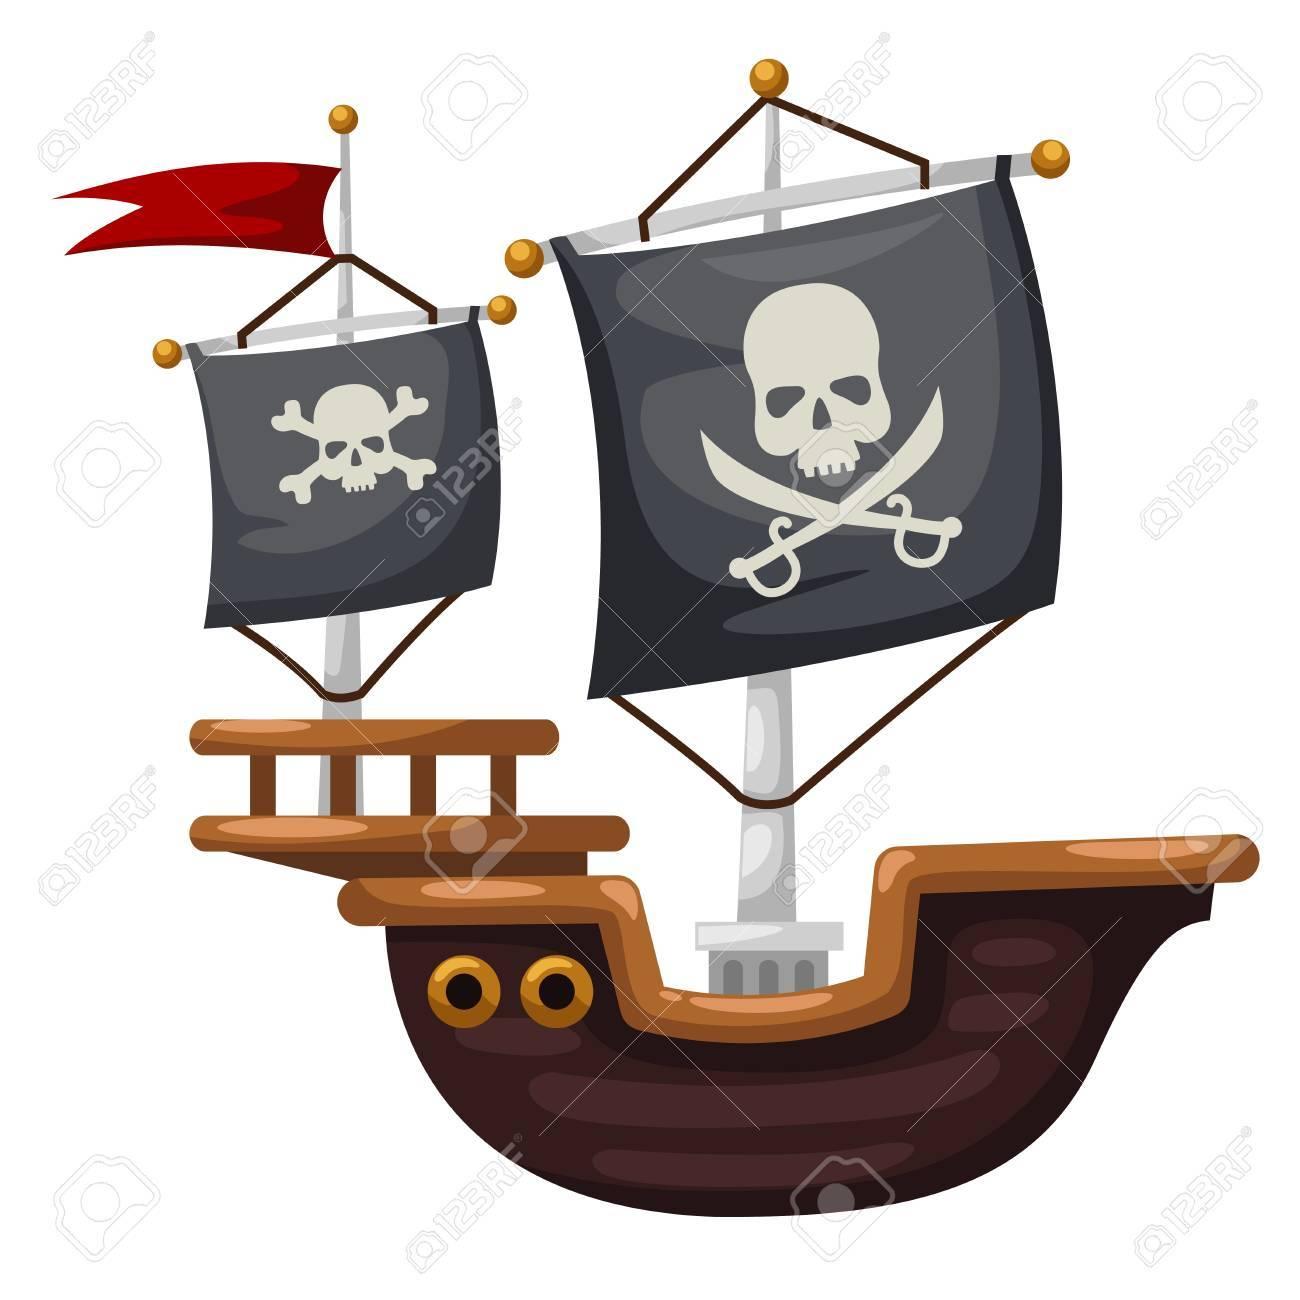 Excepcional Anatomía Barco Pirata Molde - Anatomía de Las ...